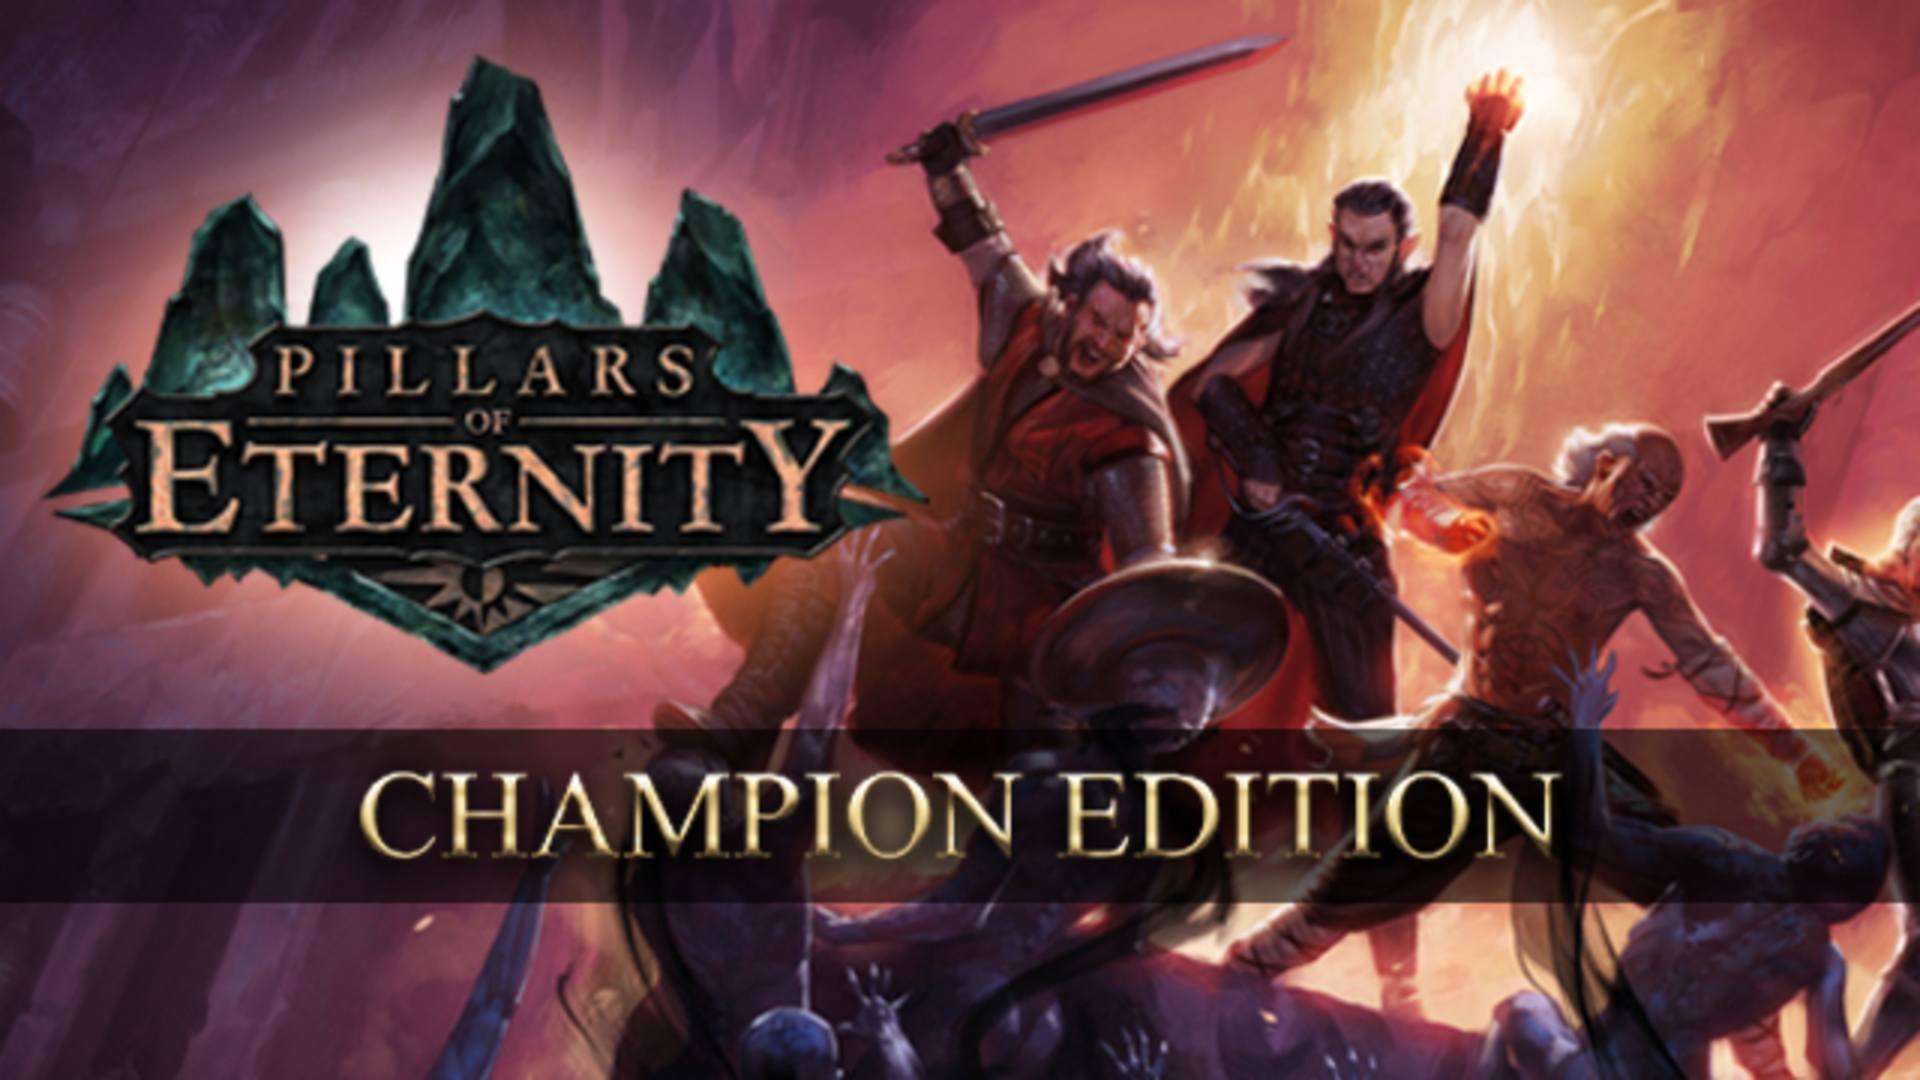 Pillars of Eternity - Champion Edition | Linux Mac PC Steam